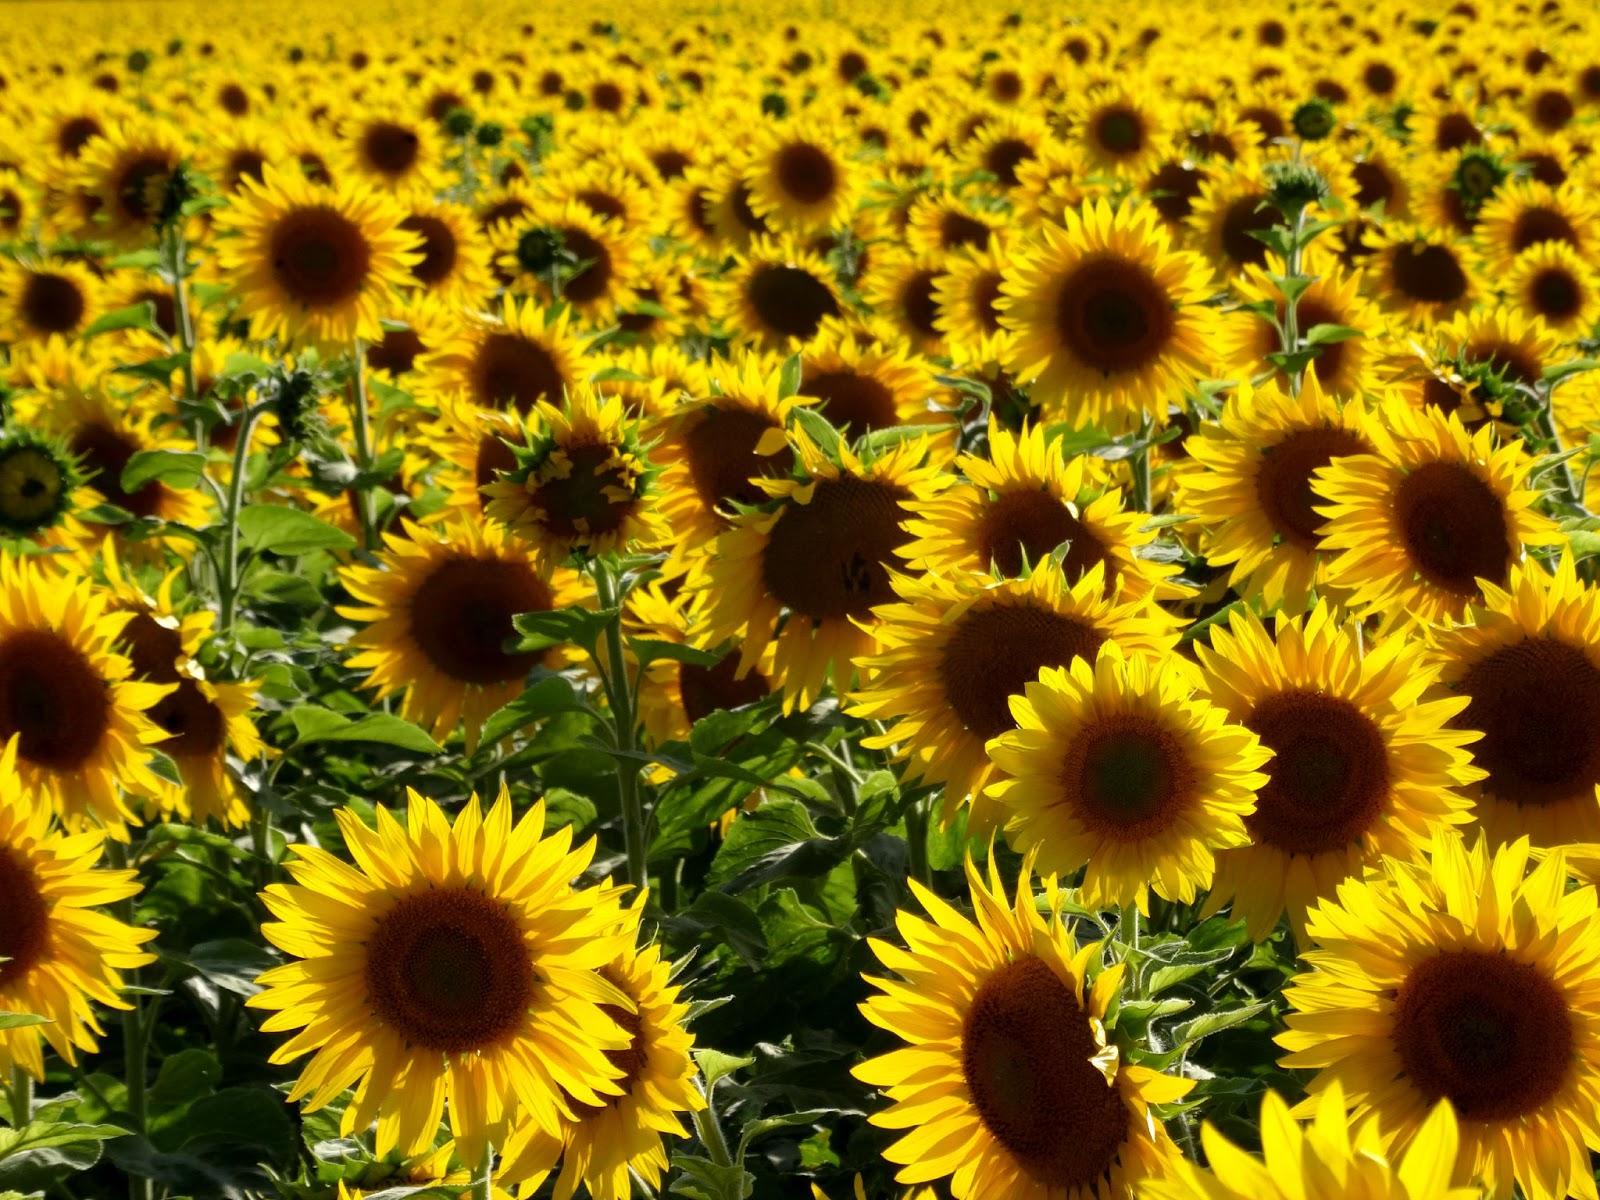 millions of sunflowers